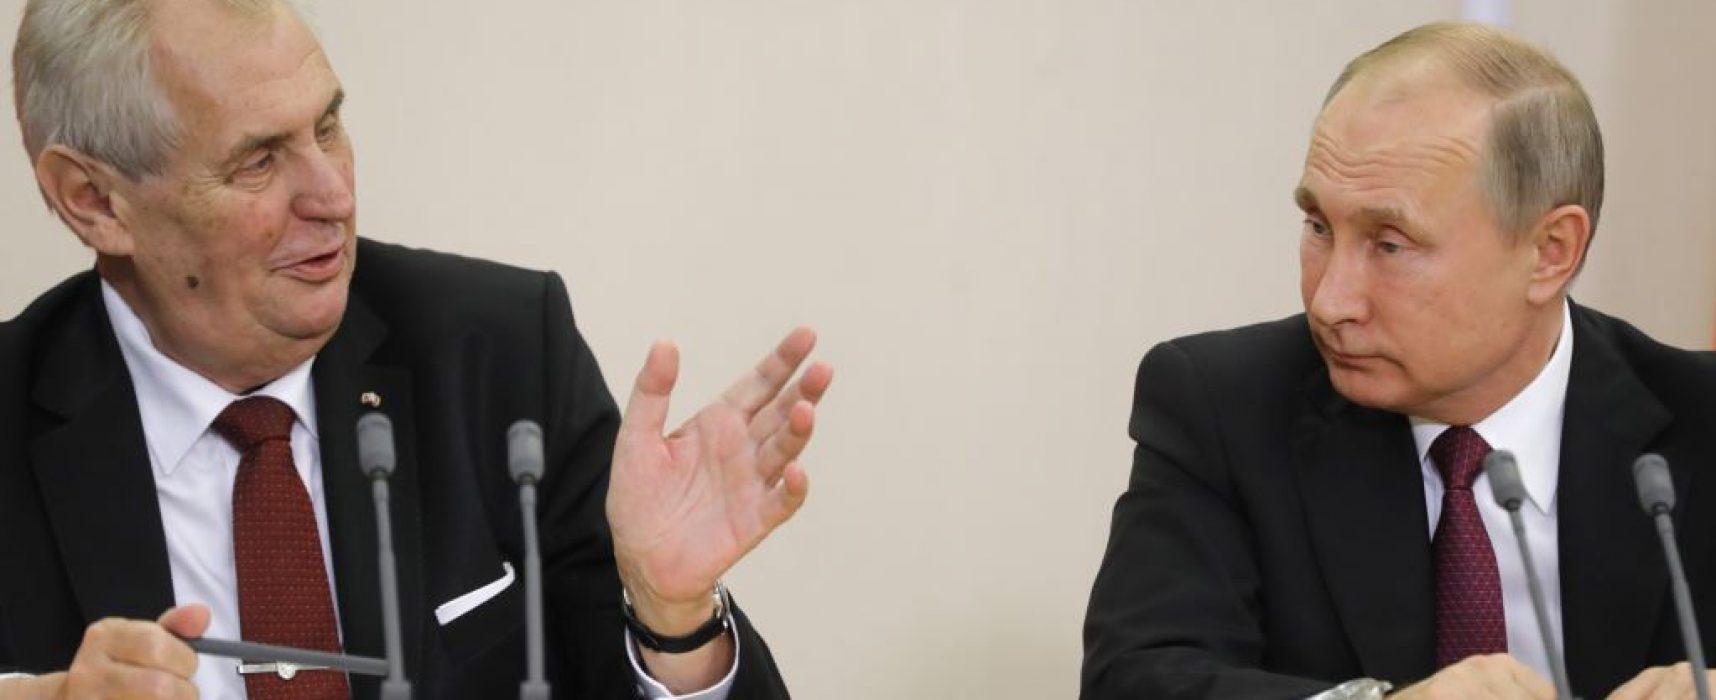 Fake news kicks into high gear in Czech presidential runoff